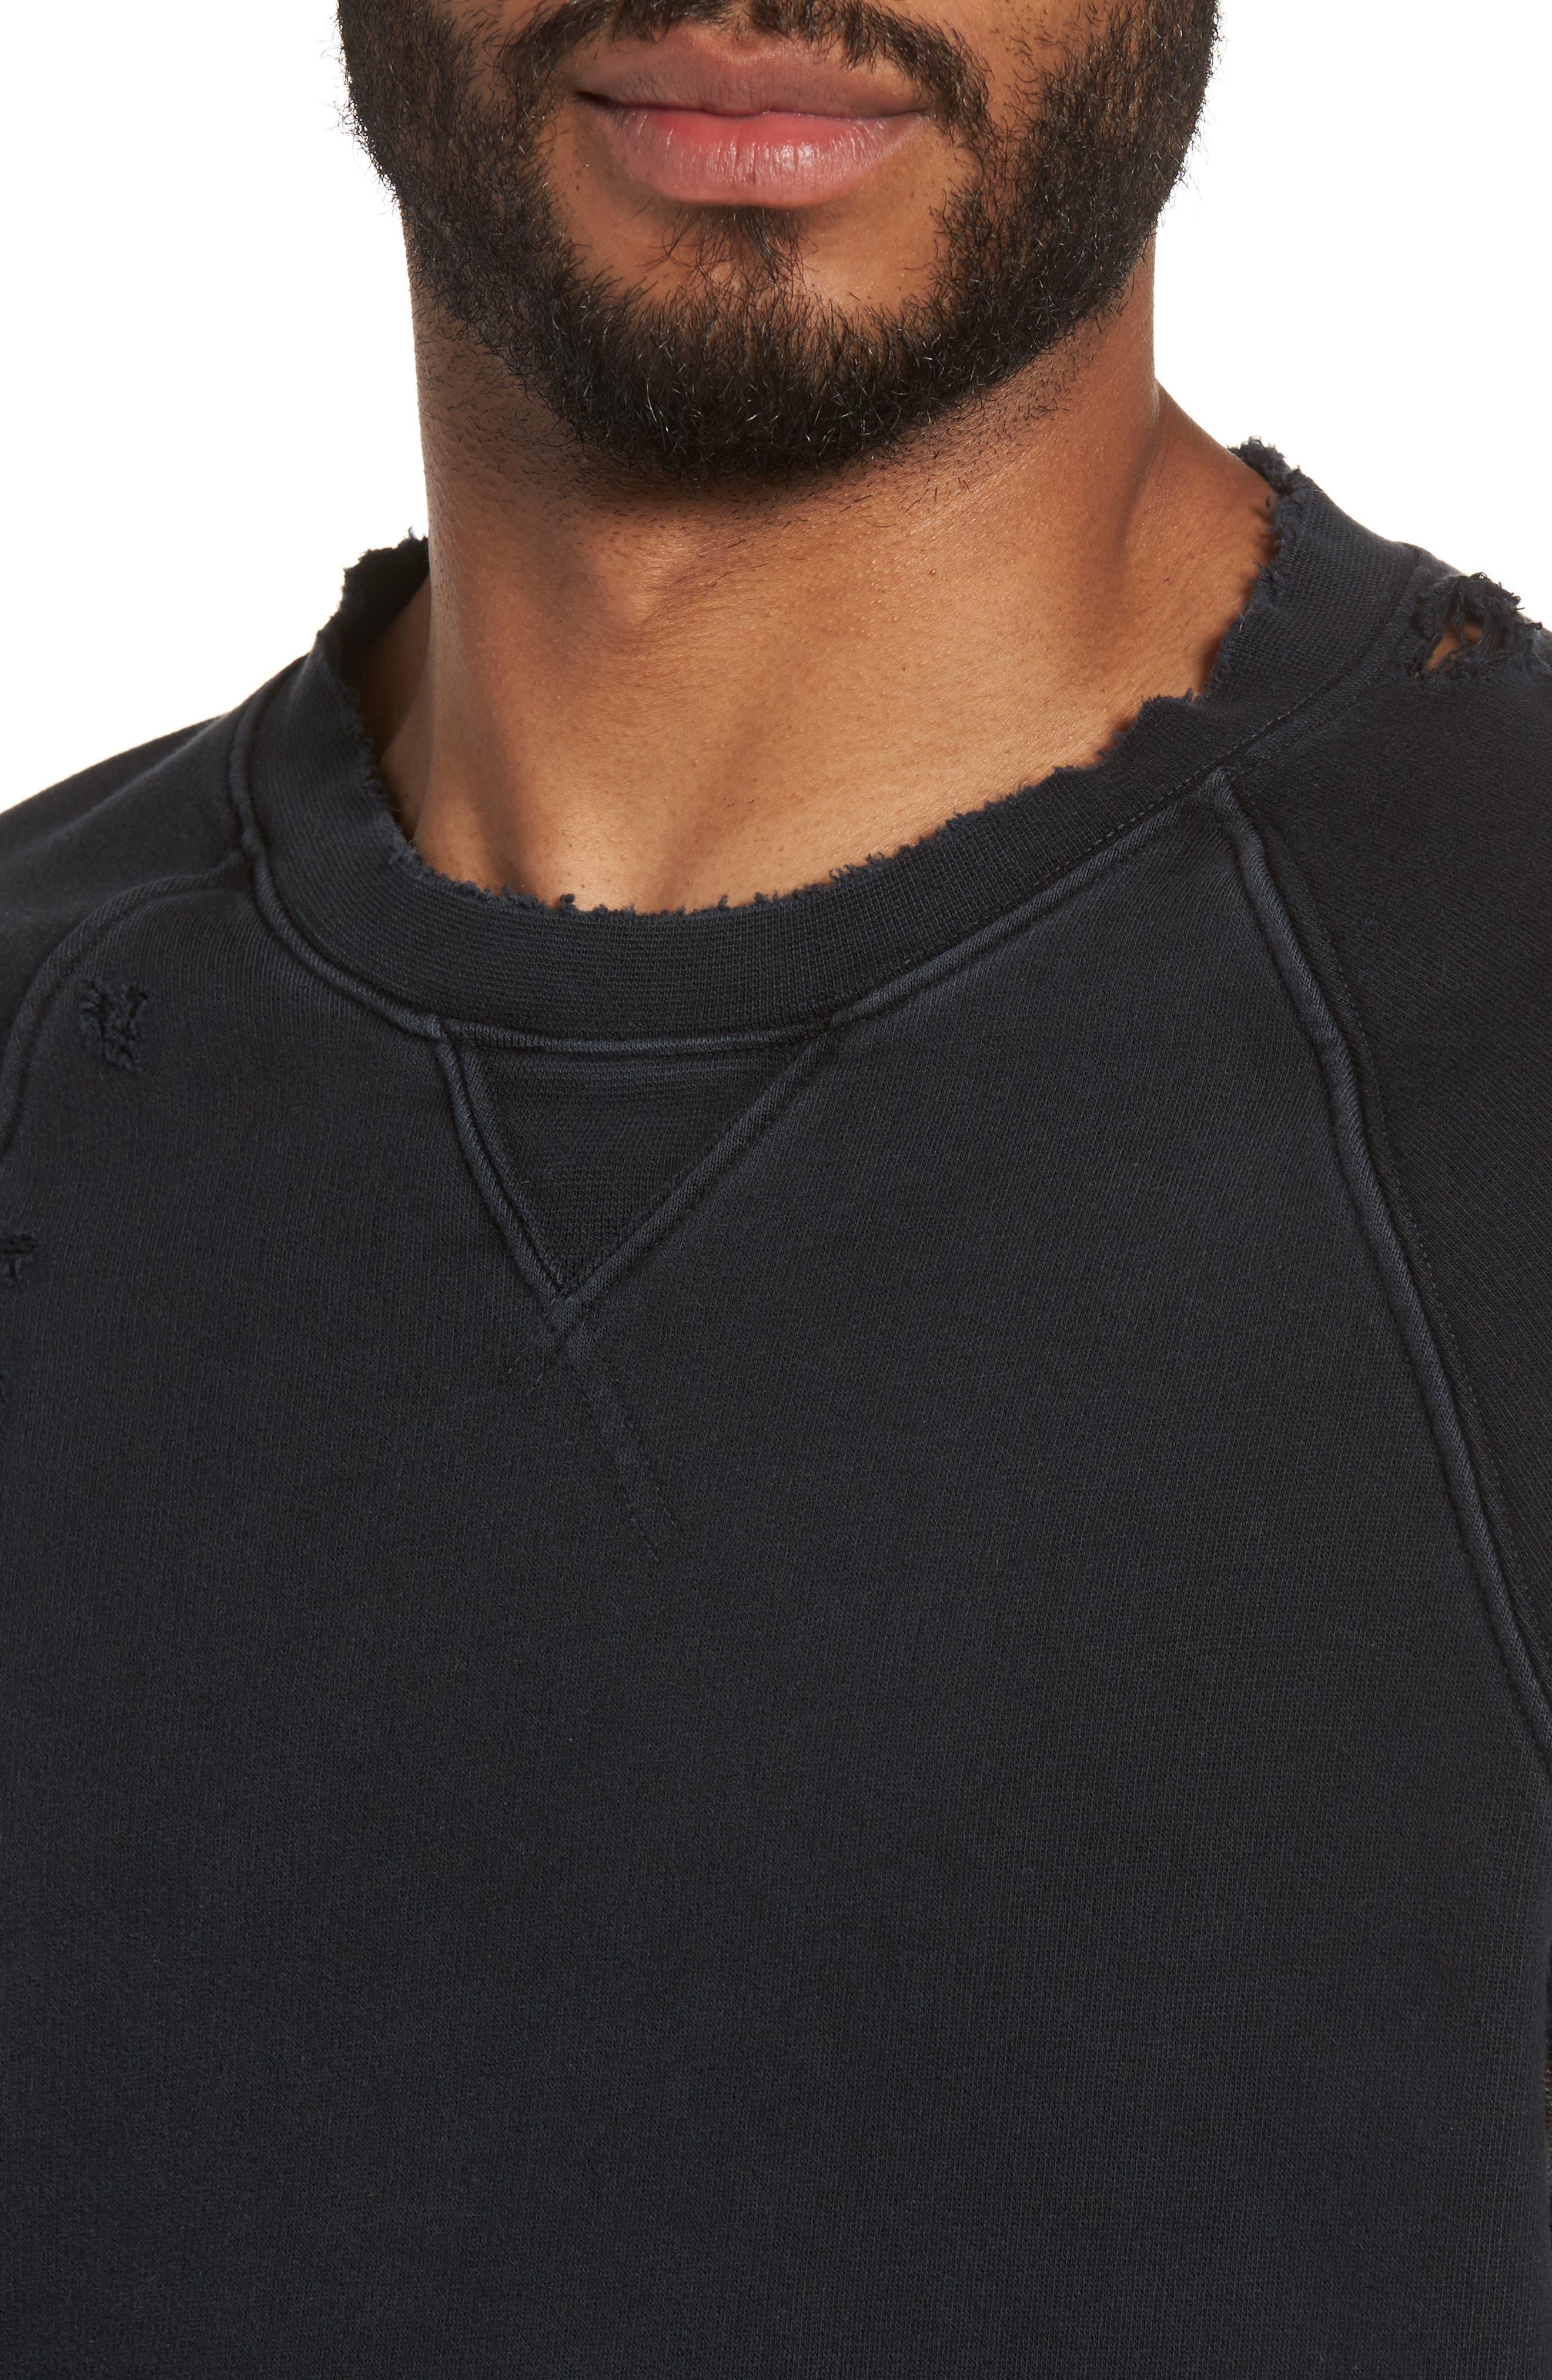 Striker Slim Fit Crewneck Sweatshirt,                             Alternate thumbnail 4, color,